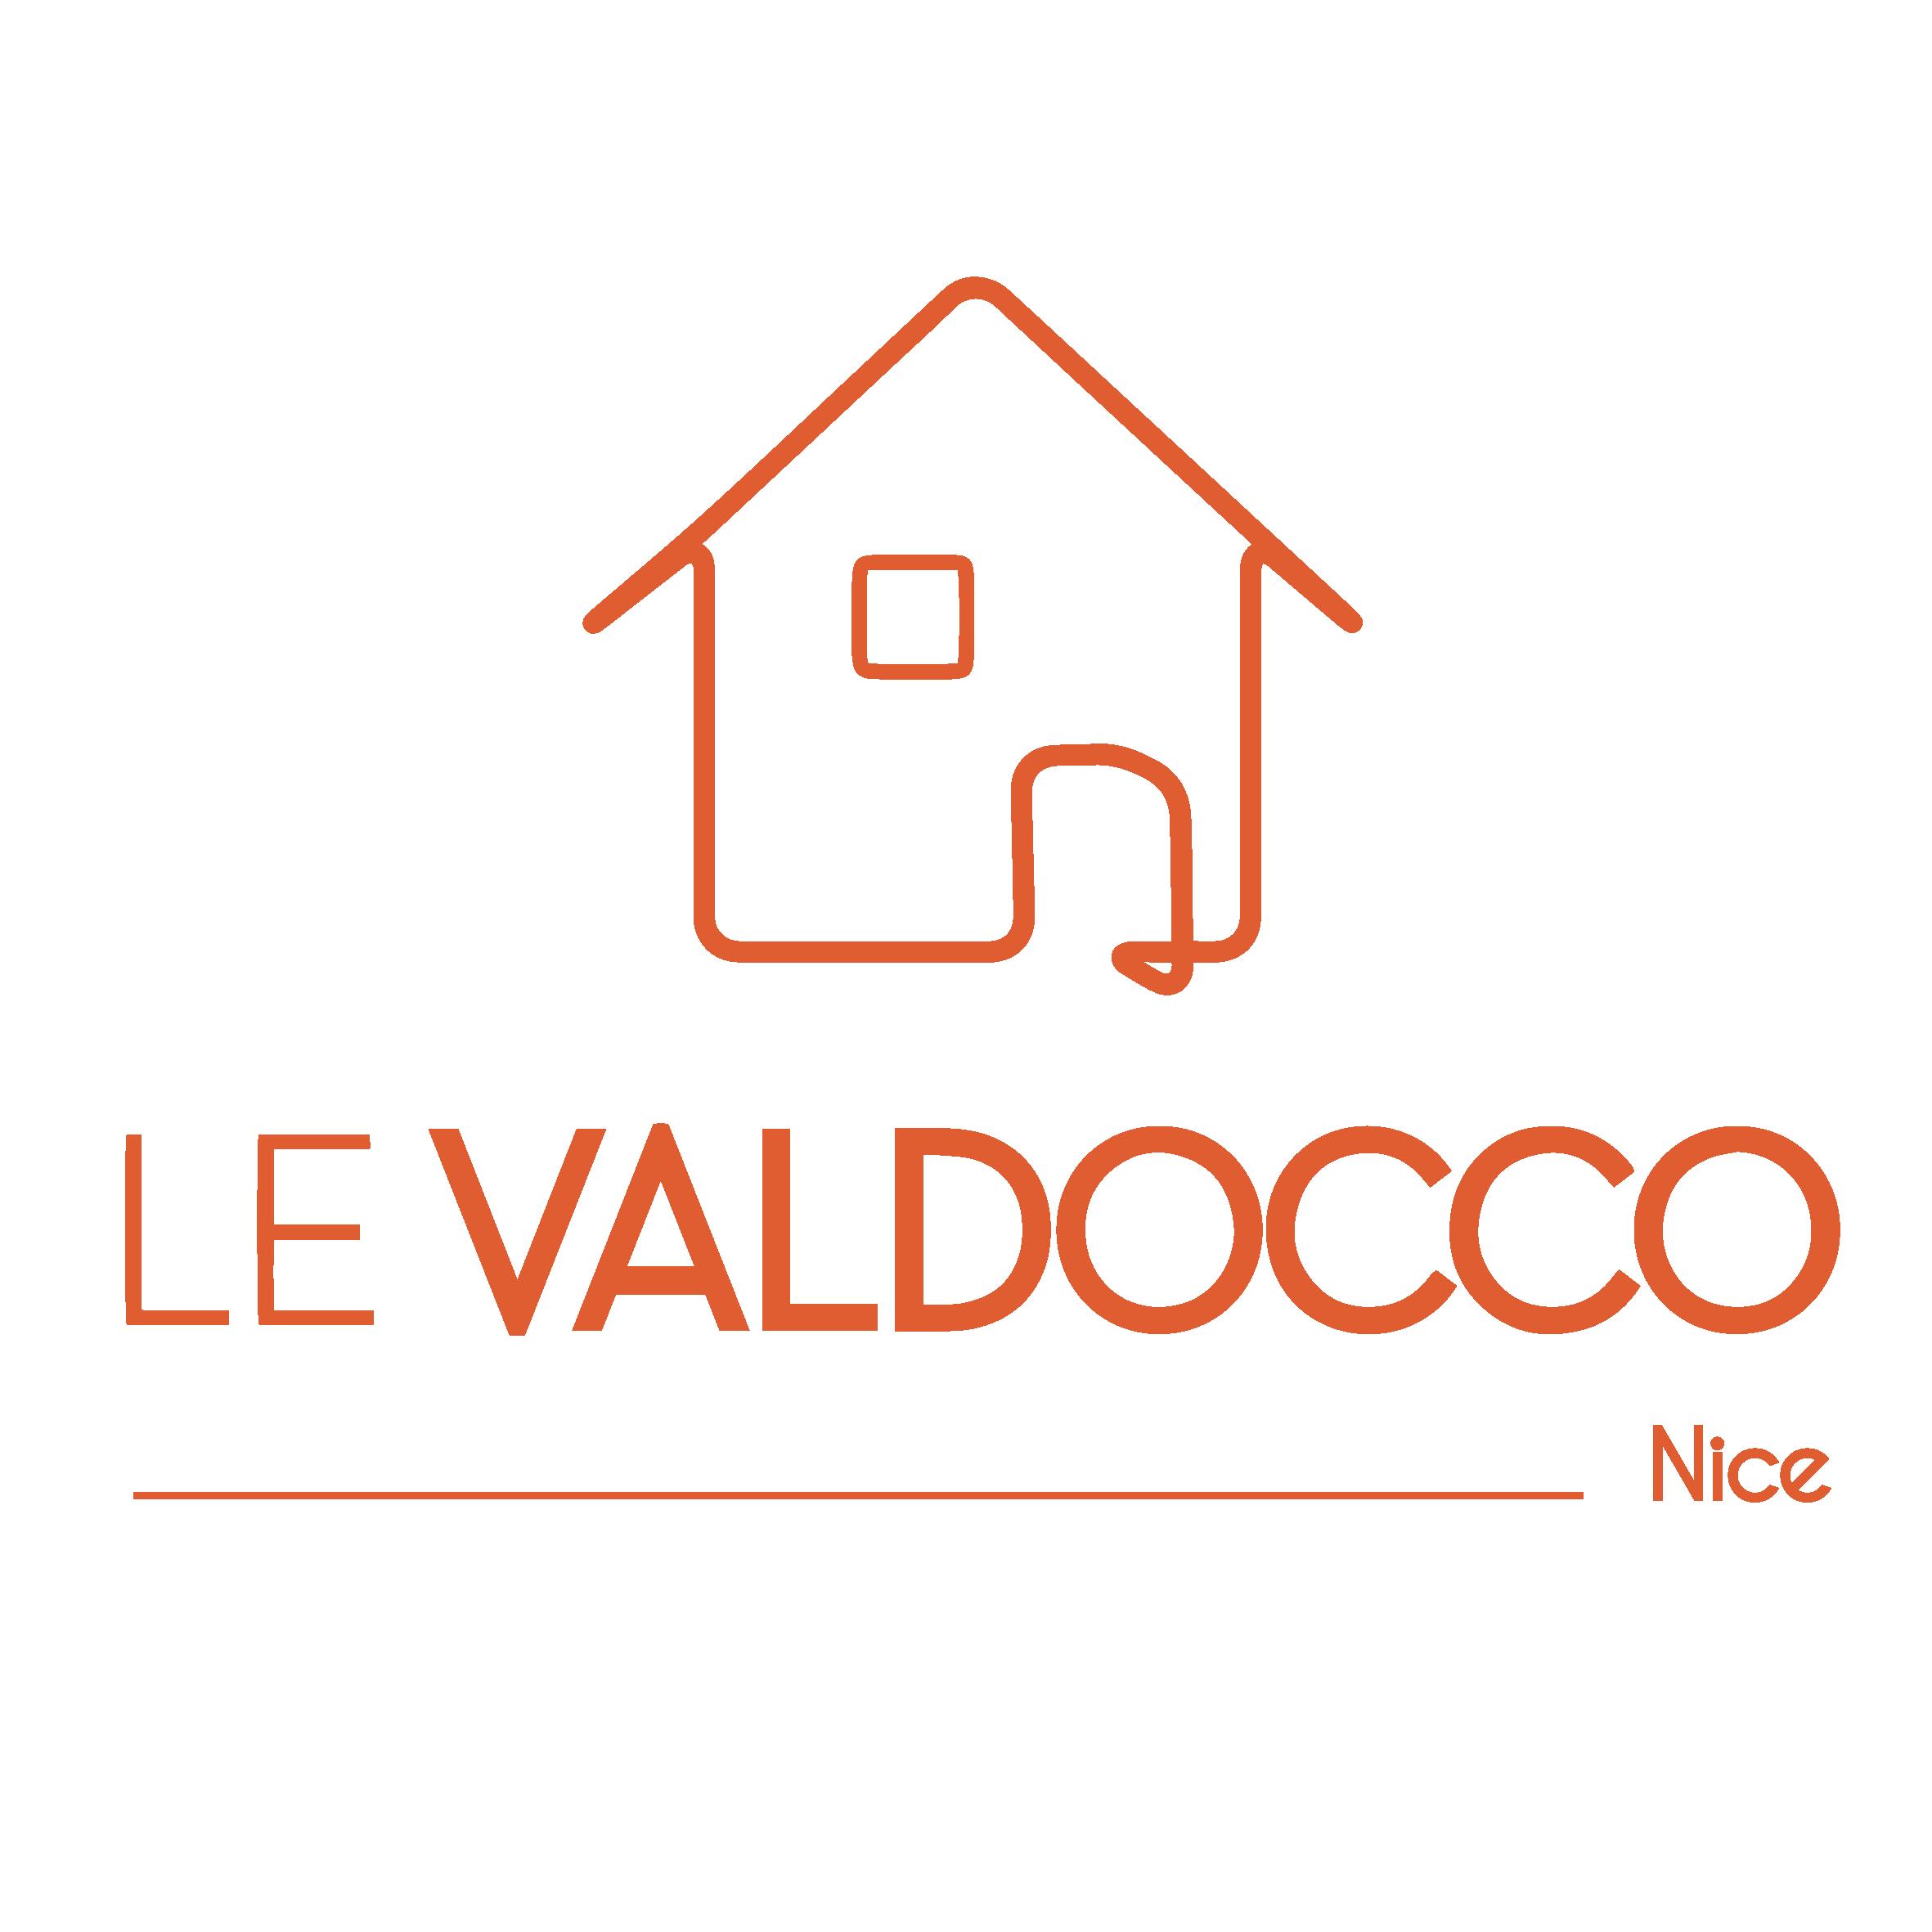 Le Valdocco_Logo Nice